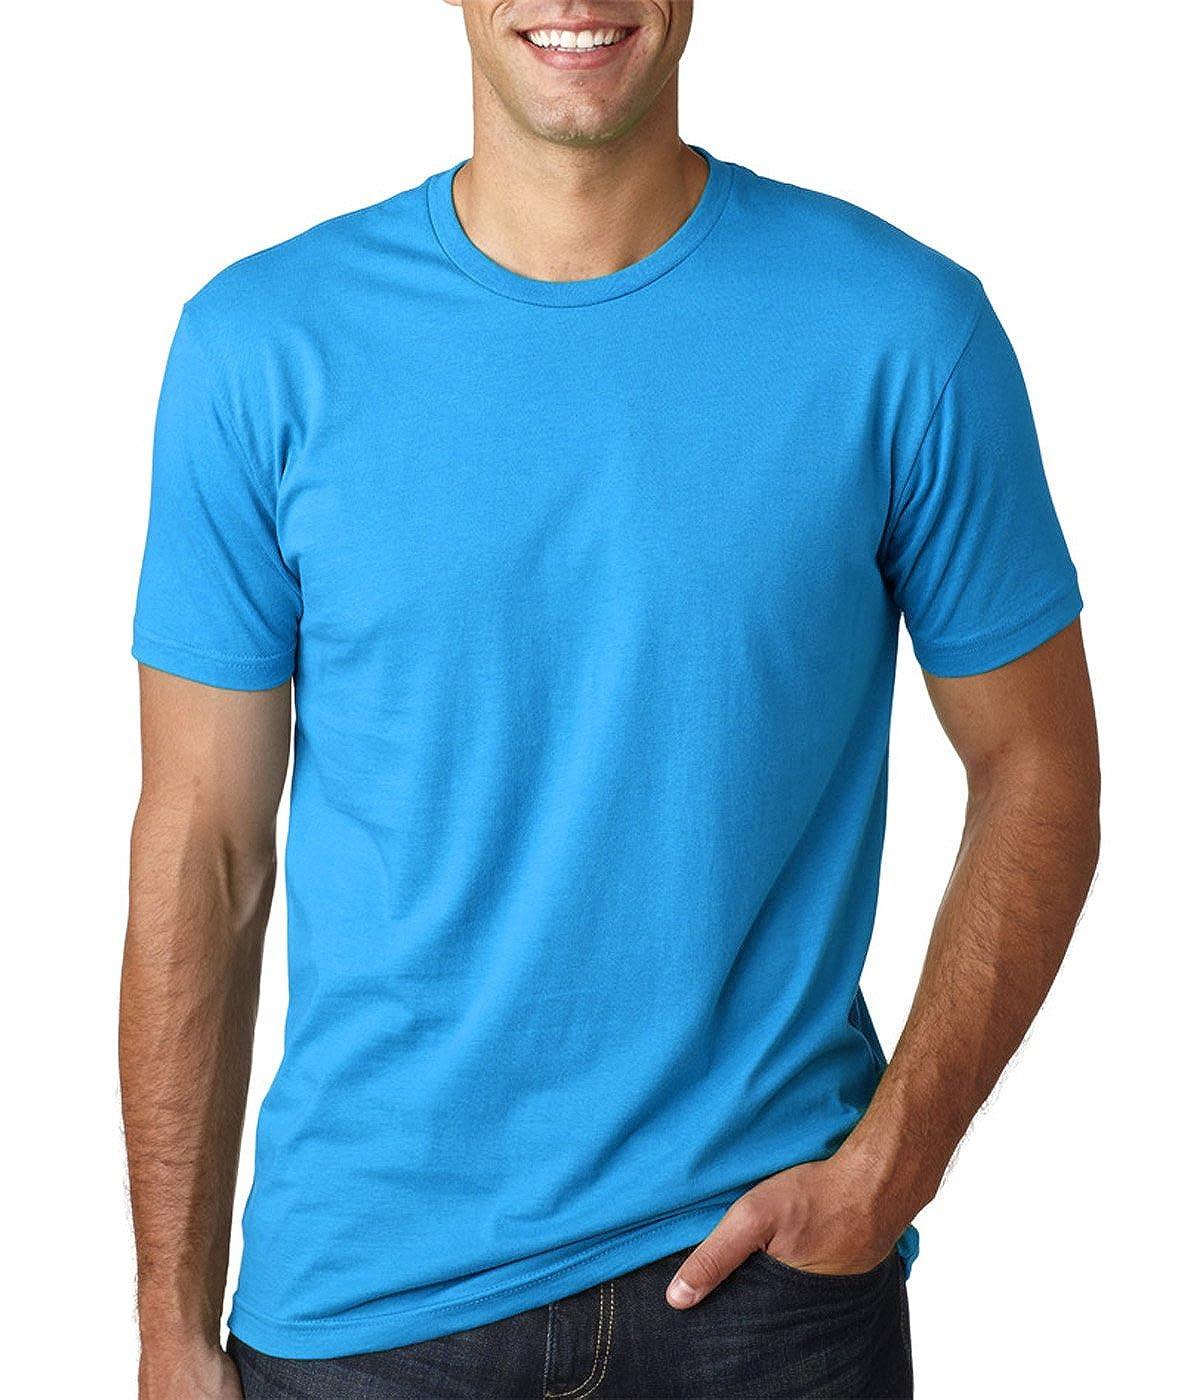 2 Pack Black - XX-Larte Turquoise Next Level Mens Premium Fitted Short-Sleeve Crew T-Shirt